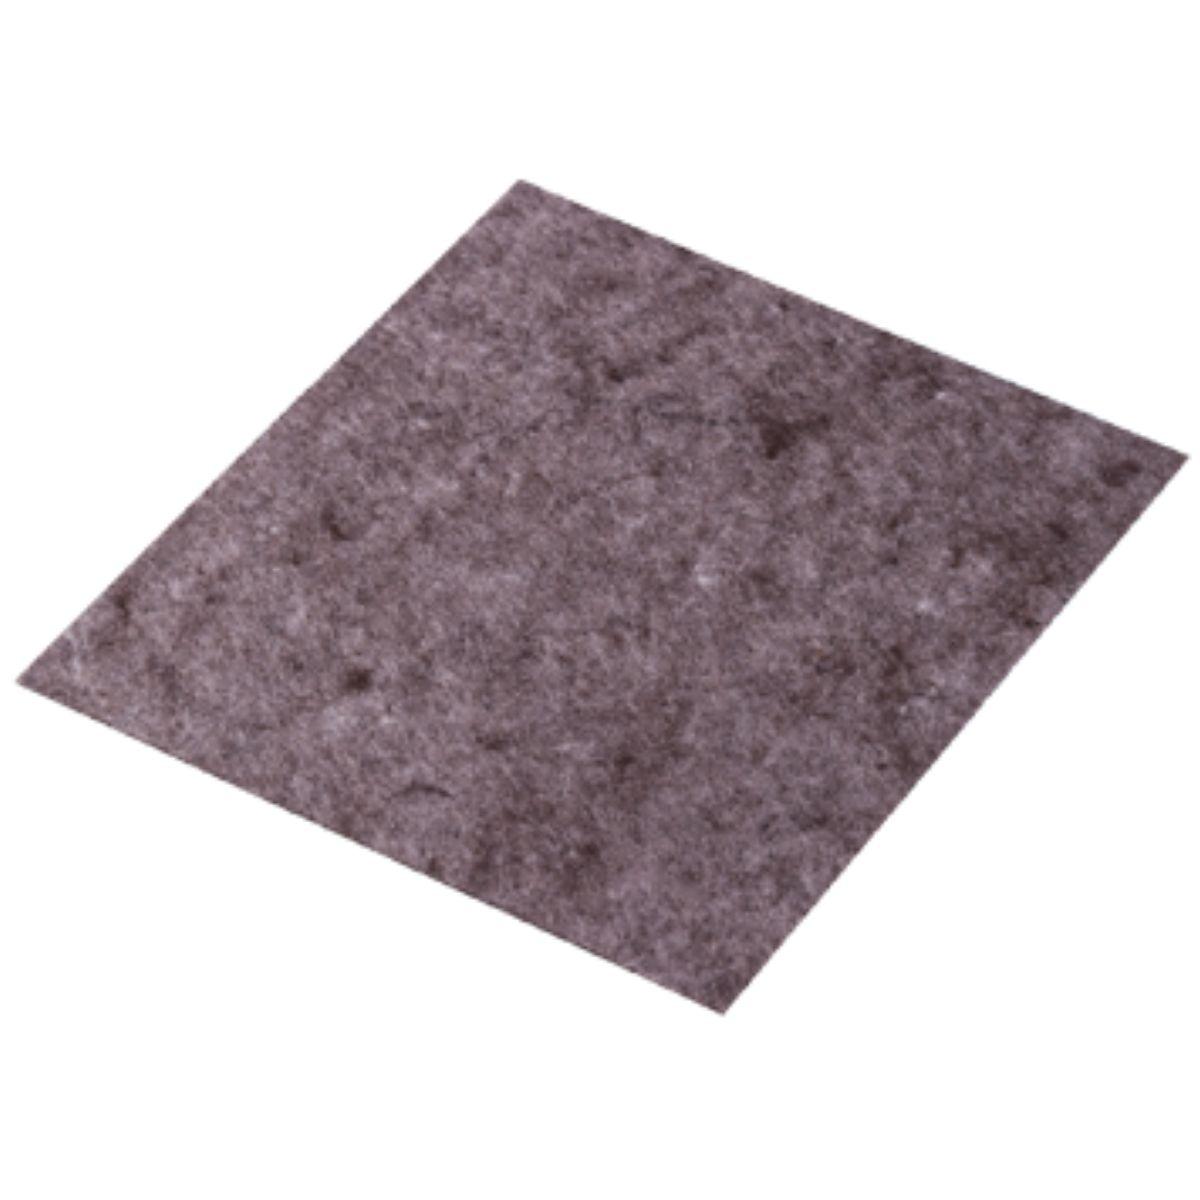 Curativo de Alginato de Cálcio com Prata SilverCare VitaMedical 10x10 - C/10 Unidades